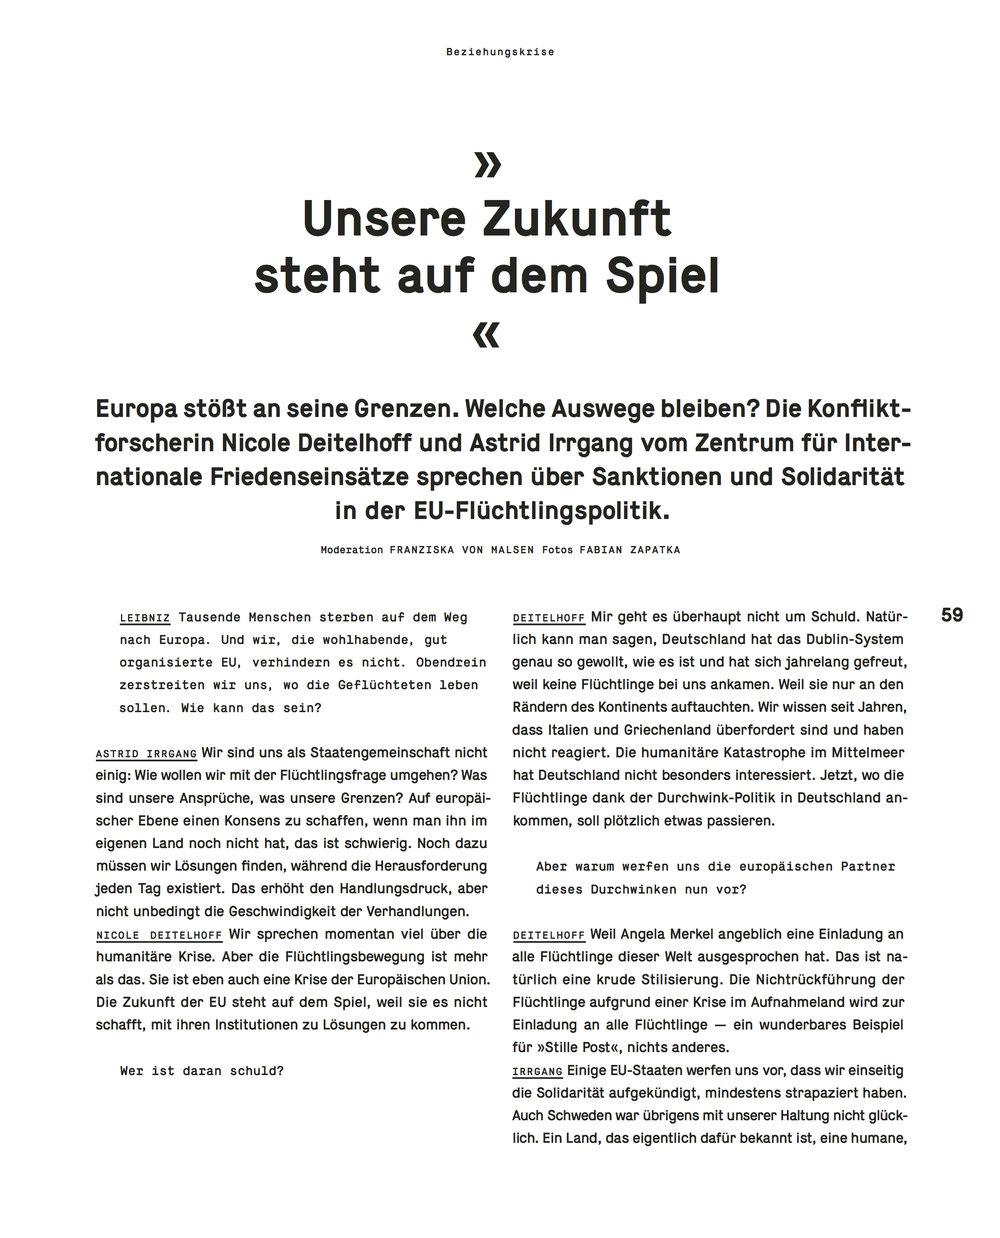 leibniz_2_2016_Flucht_web_02.jpg